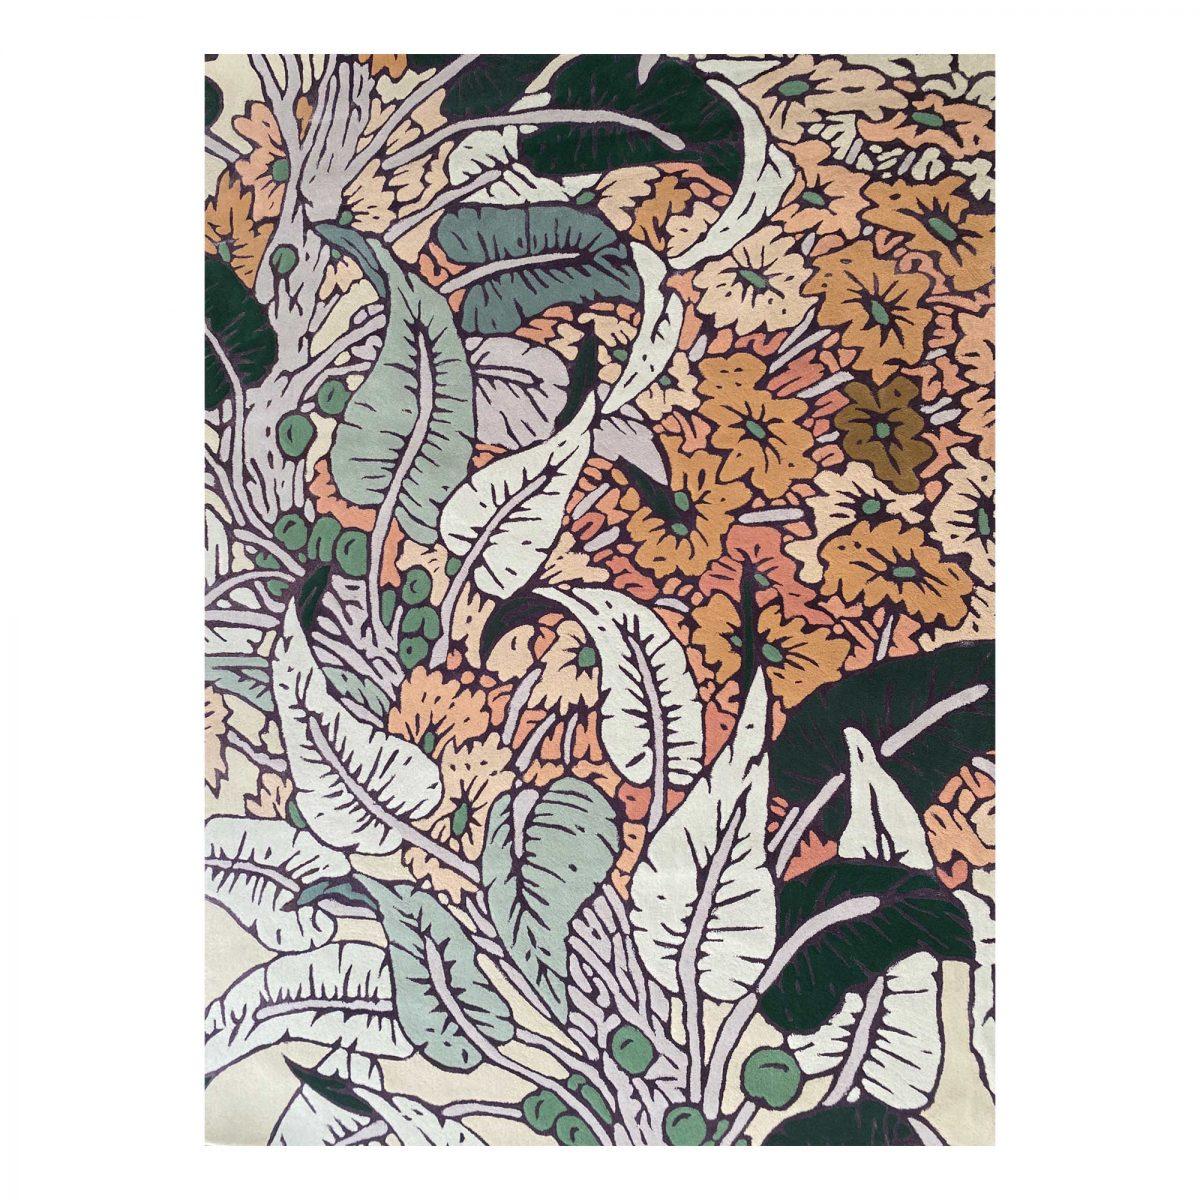 maison-dada-clement-vuillier-tapis-jardin-de-rocaille-03-rugs